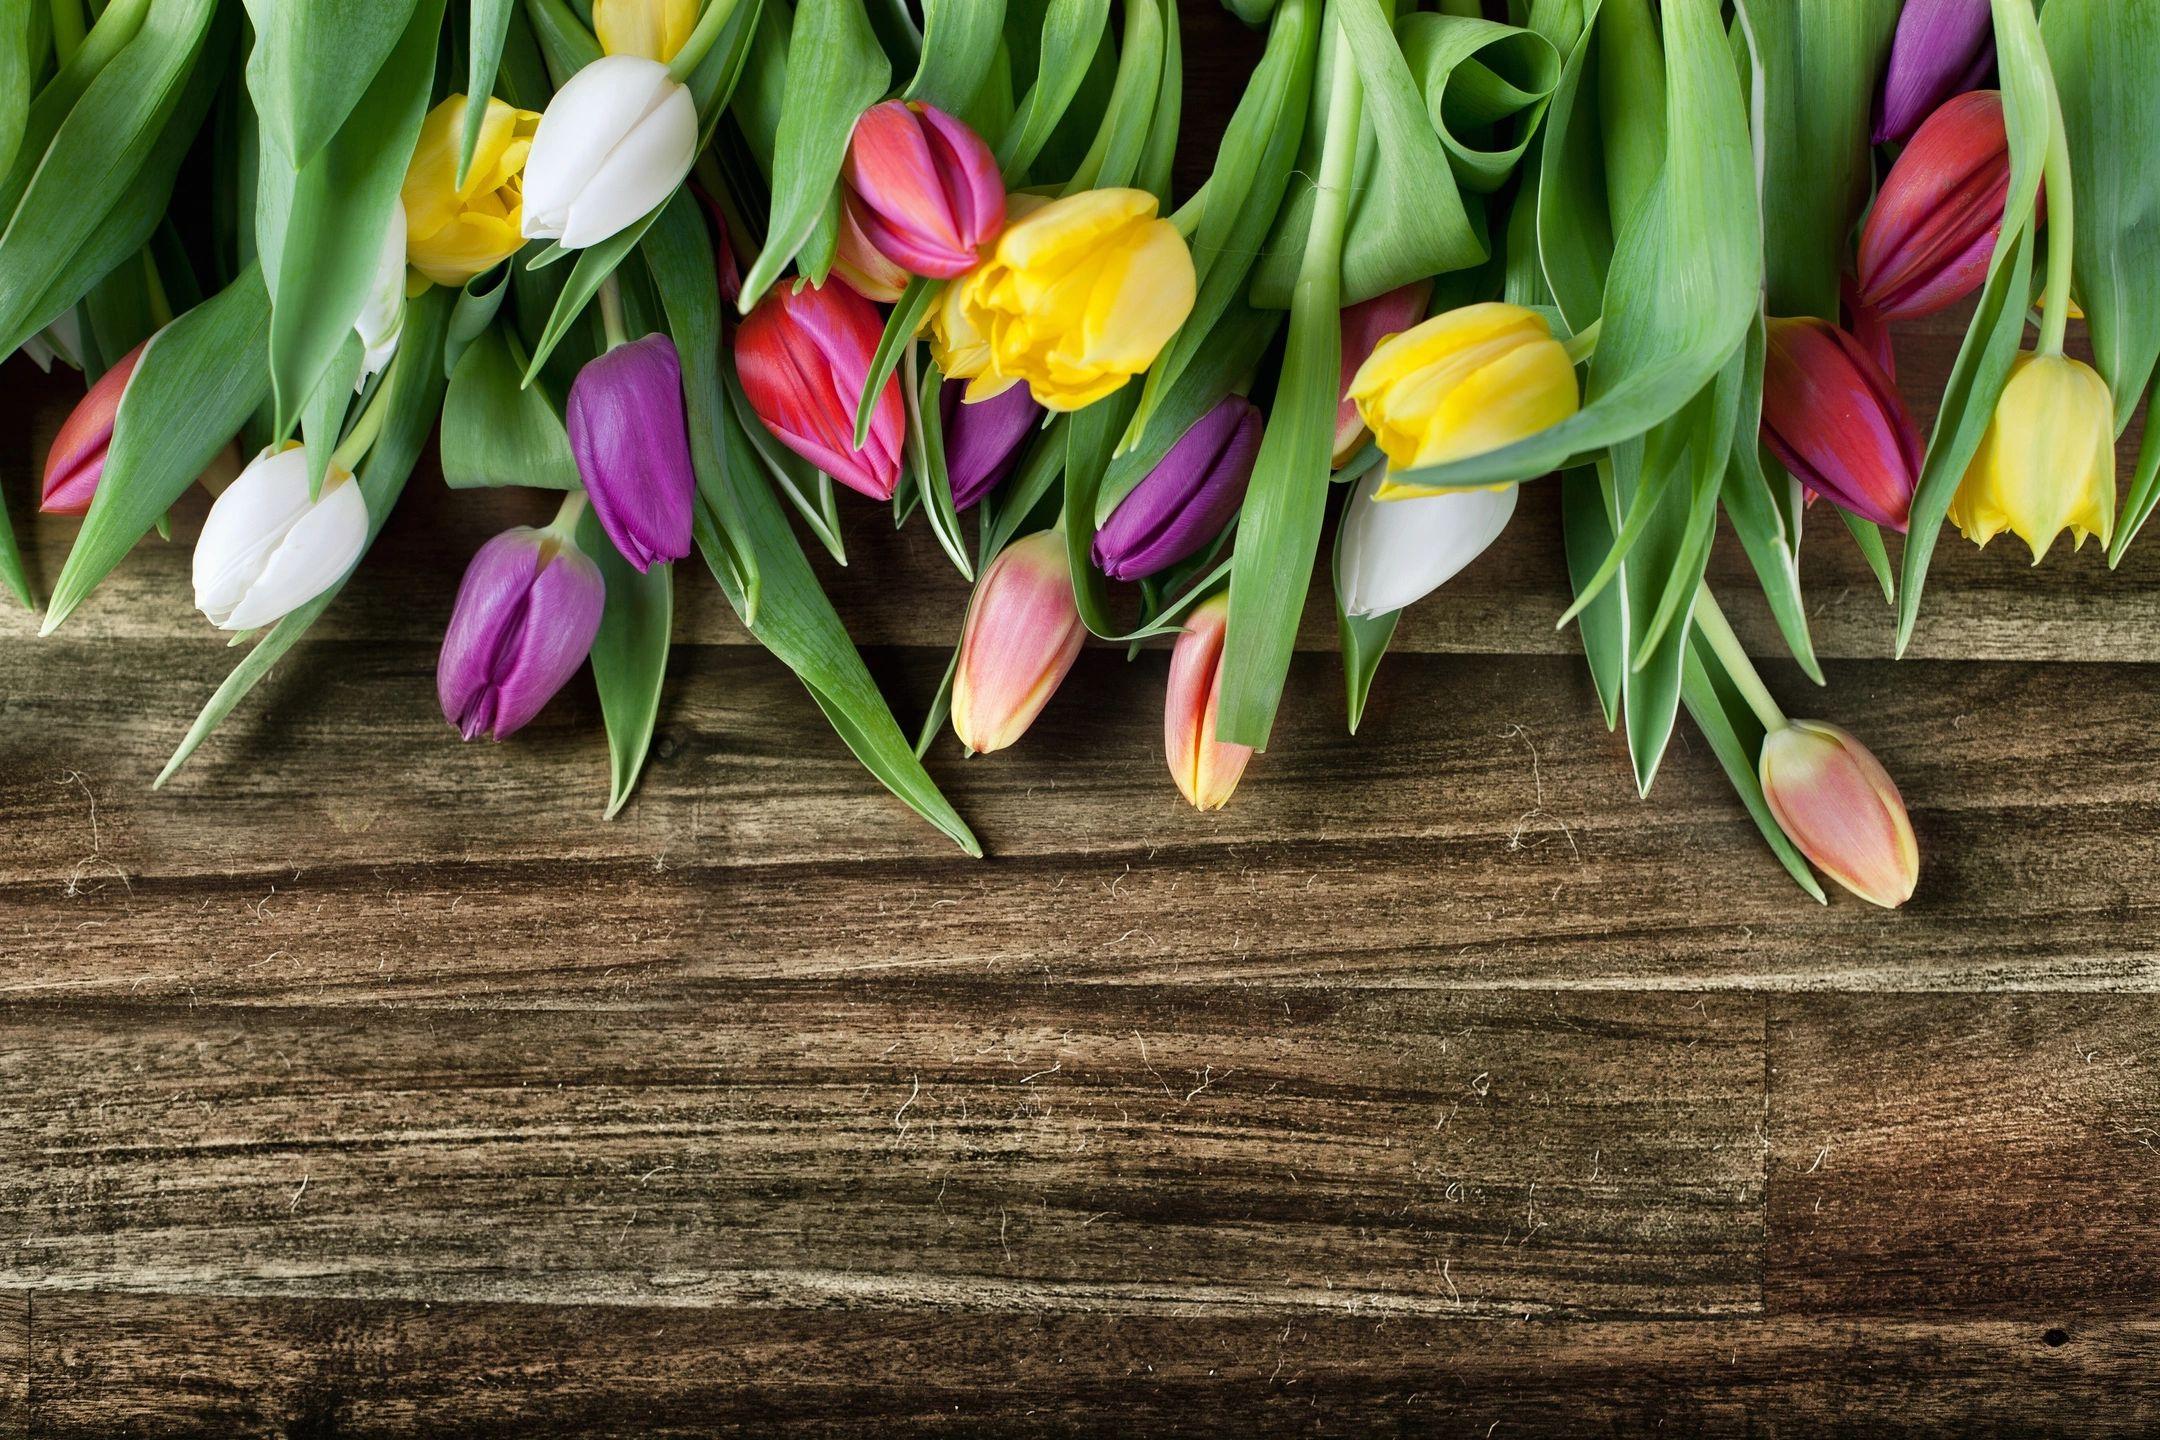 Spring 2019 Township Bulletin